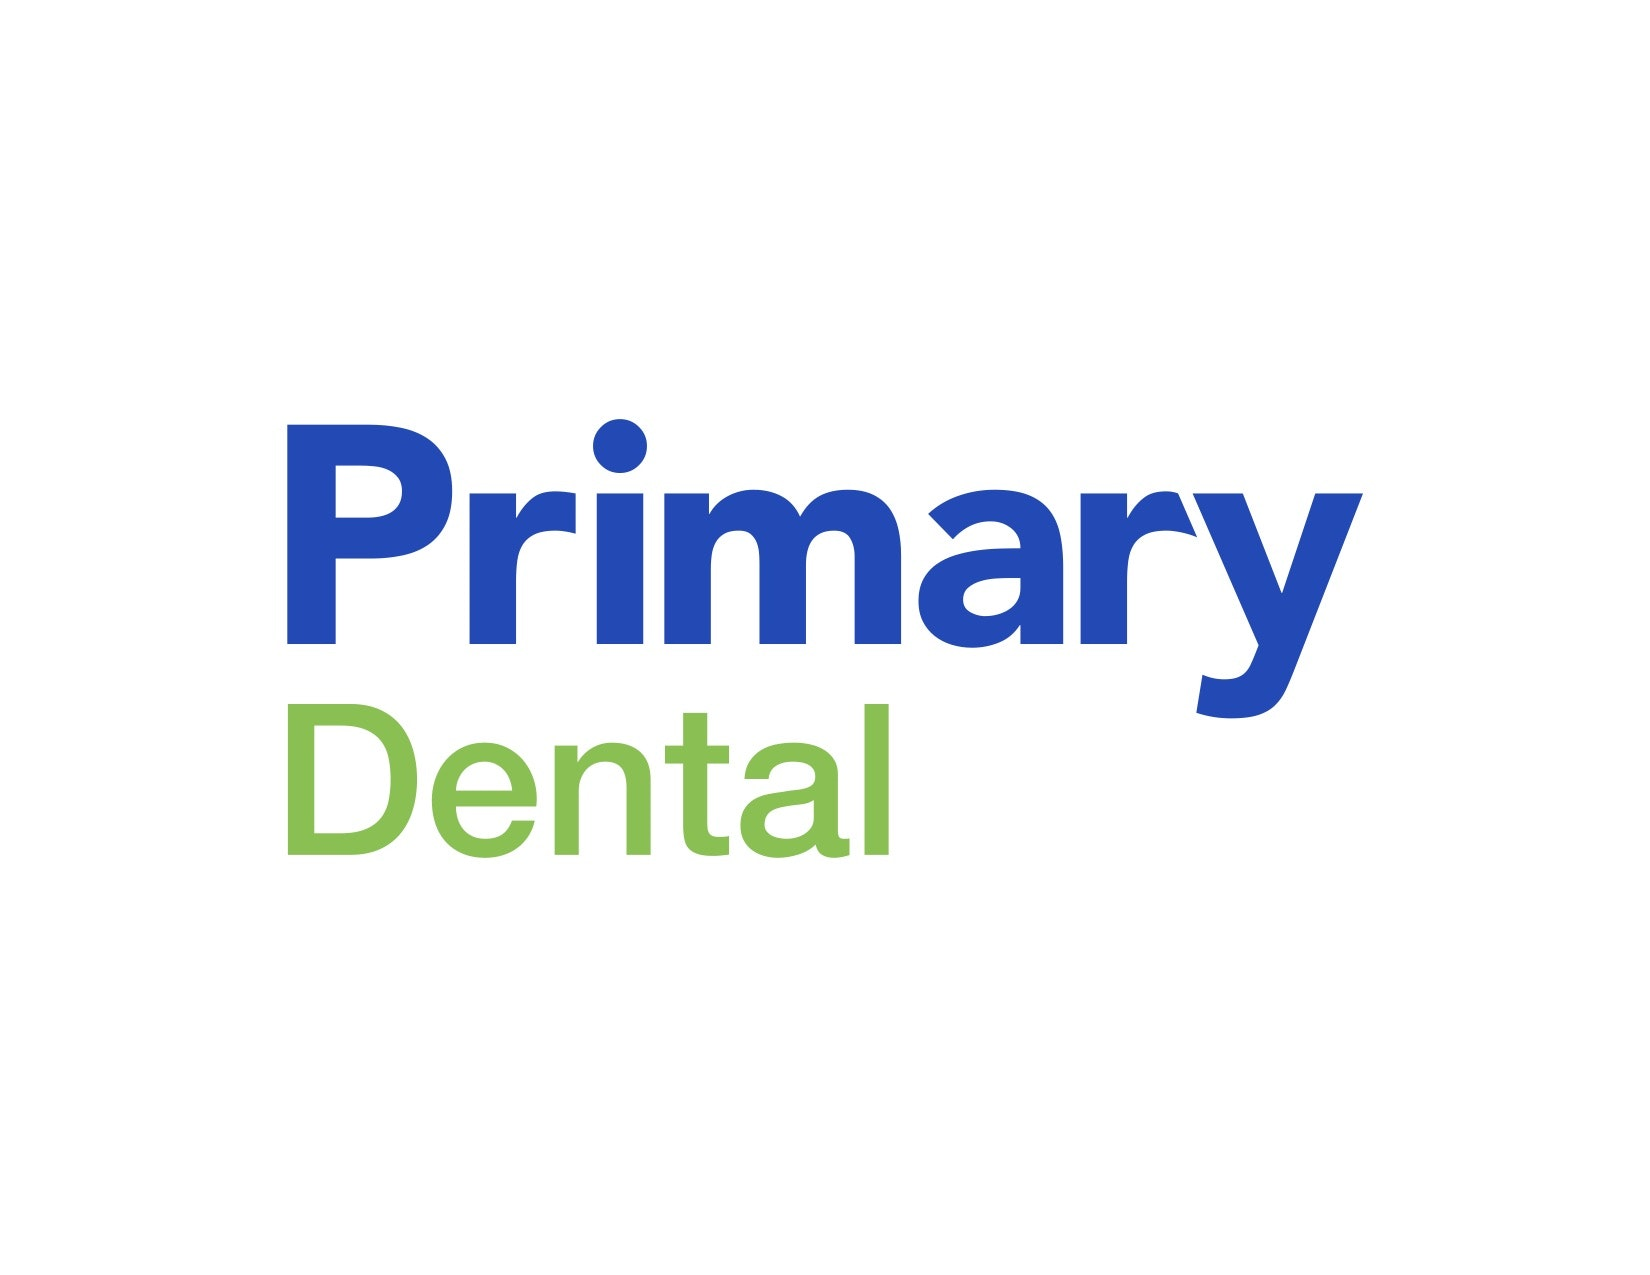 Primary Medical Centre Craigieburn (Dental)